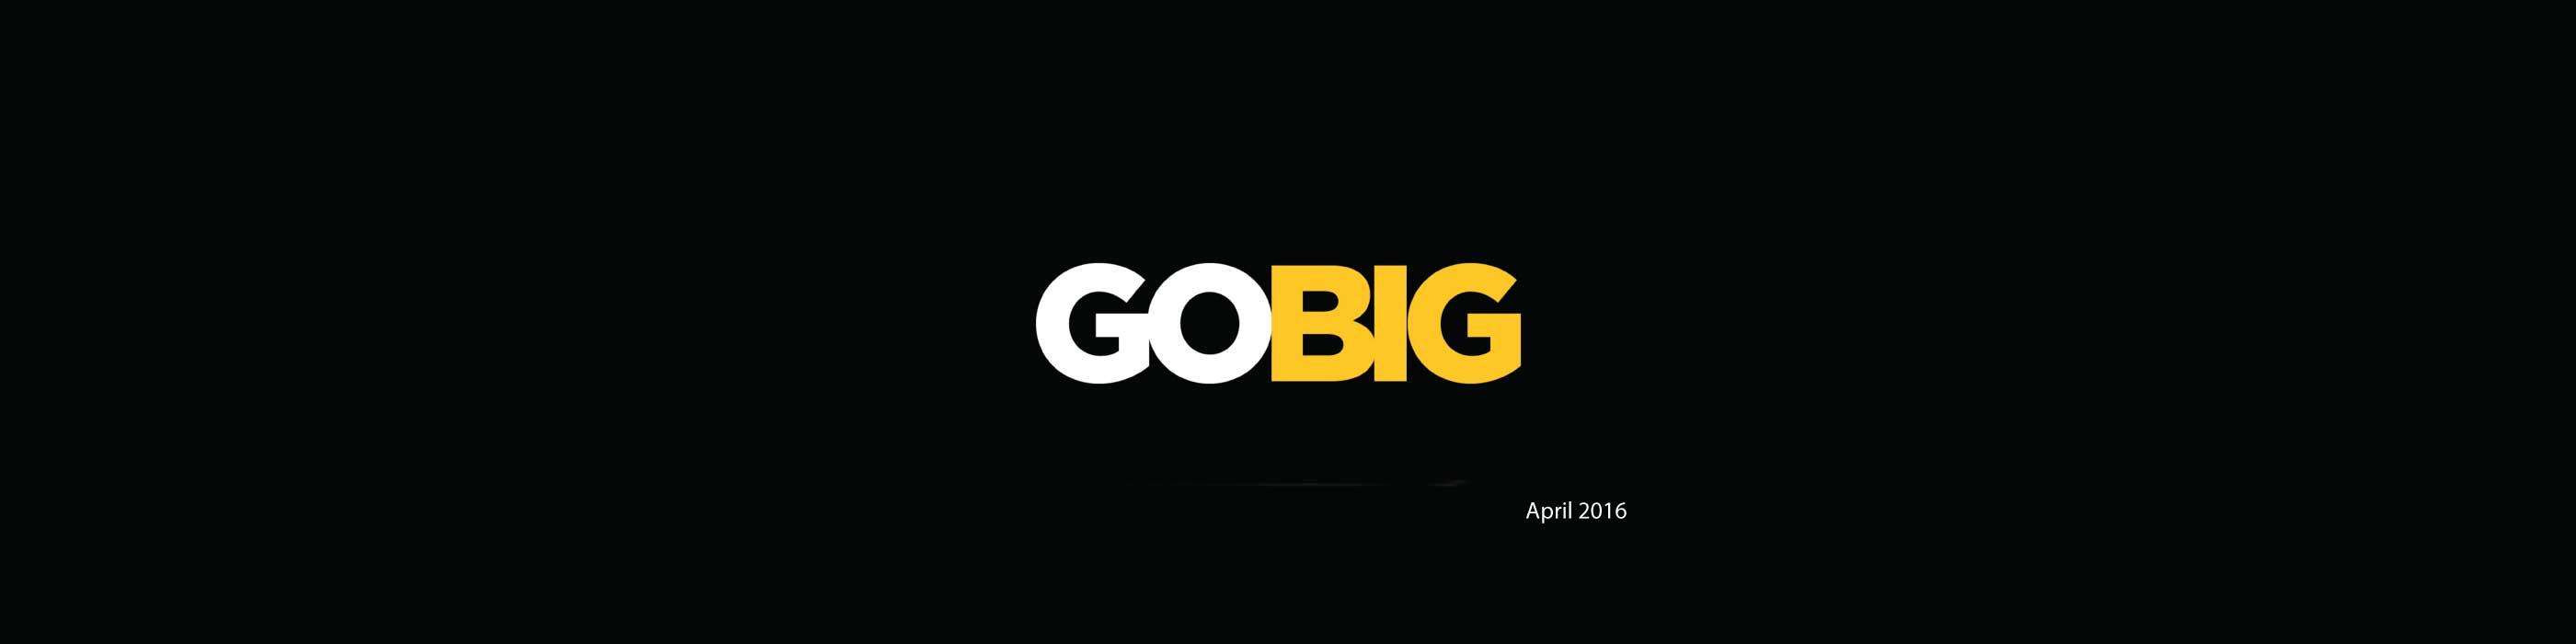 Summit-Go-Big-0416-Final-web-2800x700